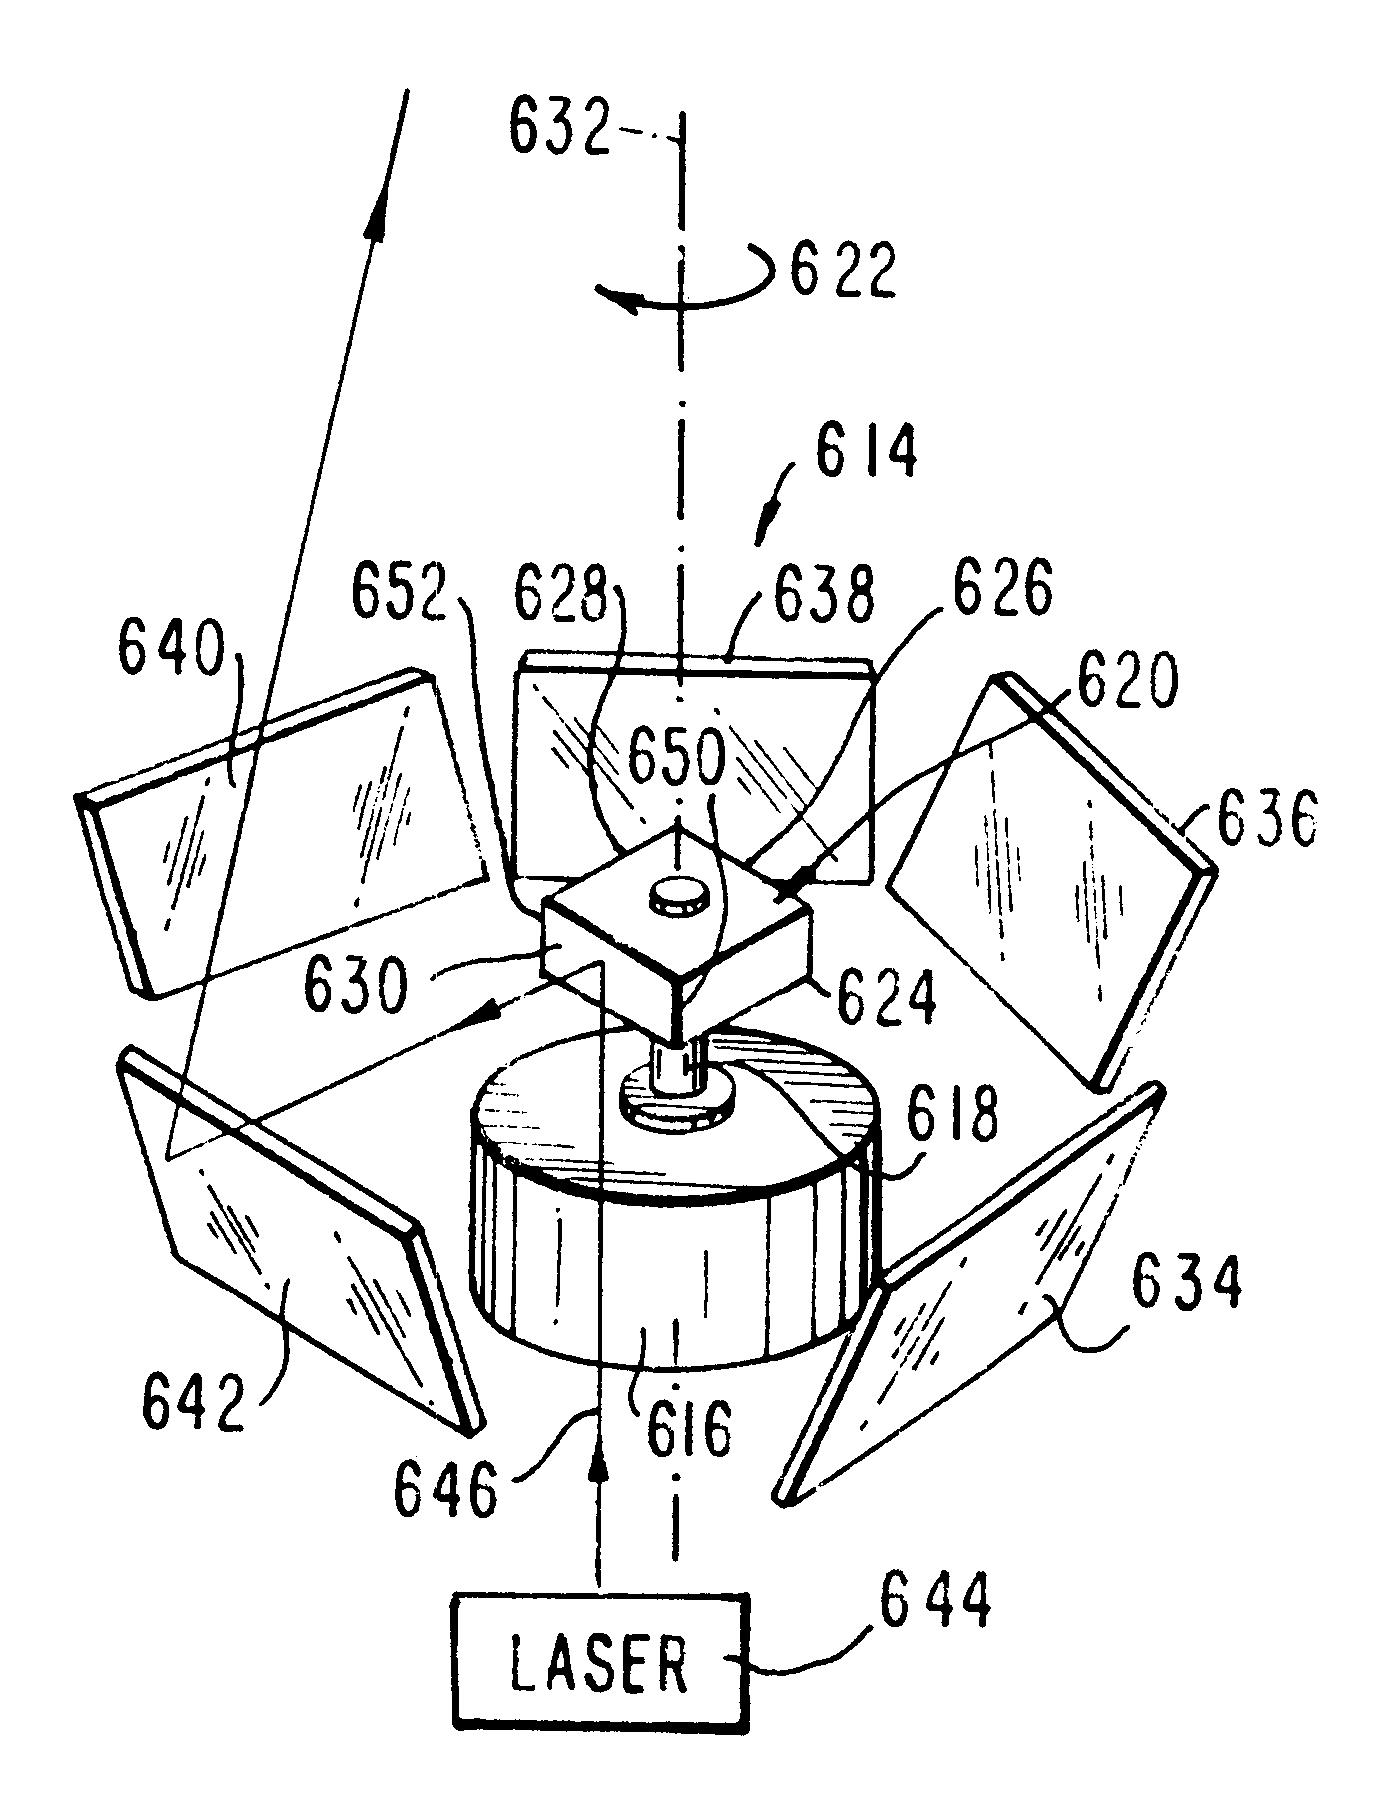 Single Line Art Generator : Patent us scan pattern generator convertible